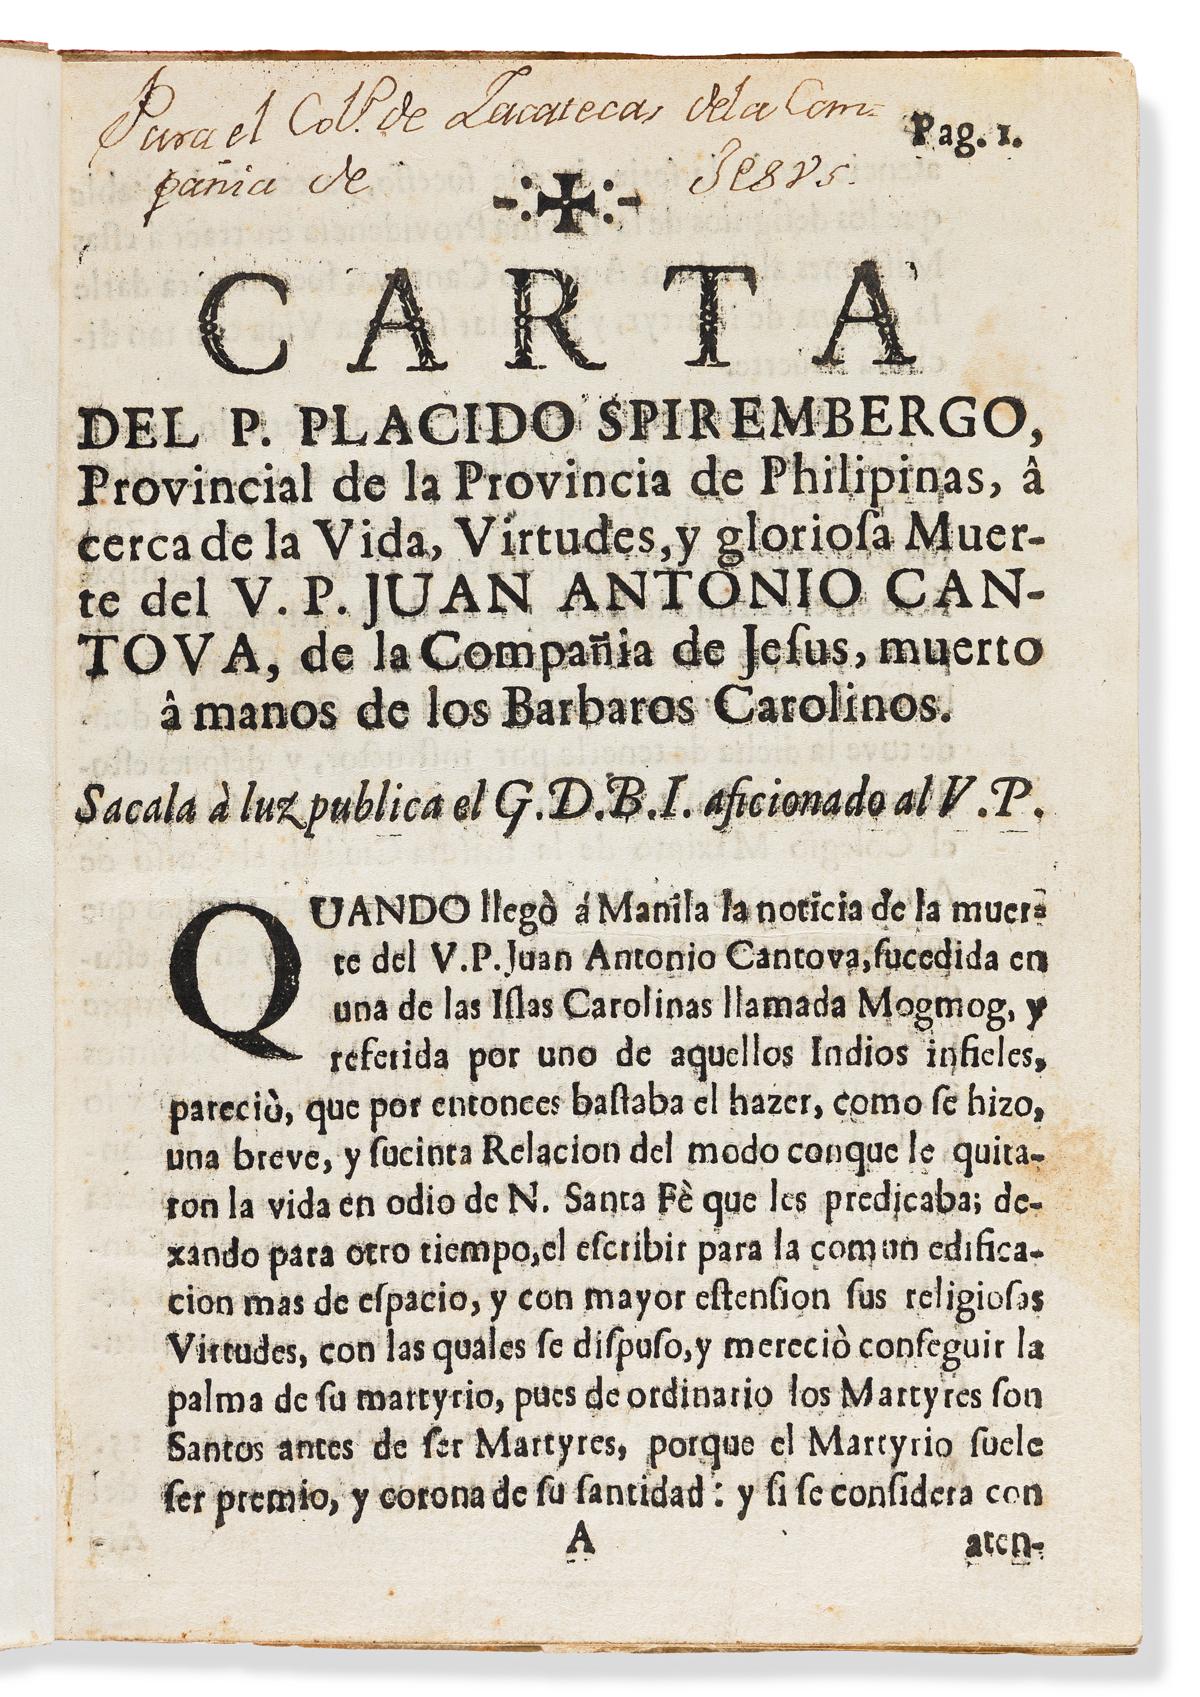 Spirembergo, Plácido [aka Foucher Spilimberg] Carta del P. Placido Spirembergo, Provincial de la Provincia de Philipinas, á cerca de la